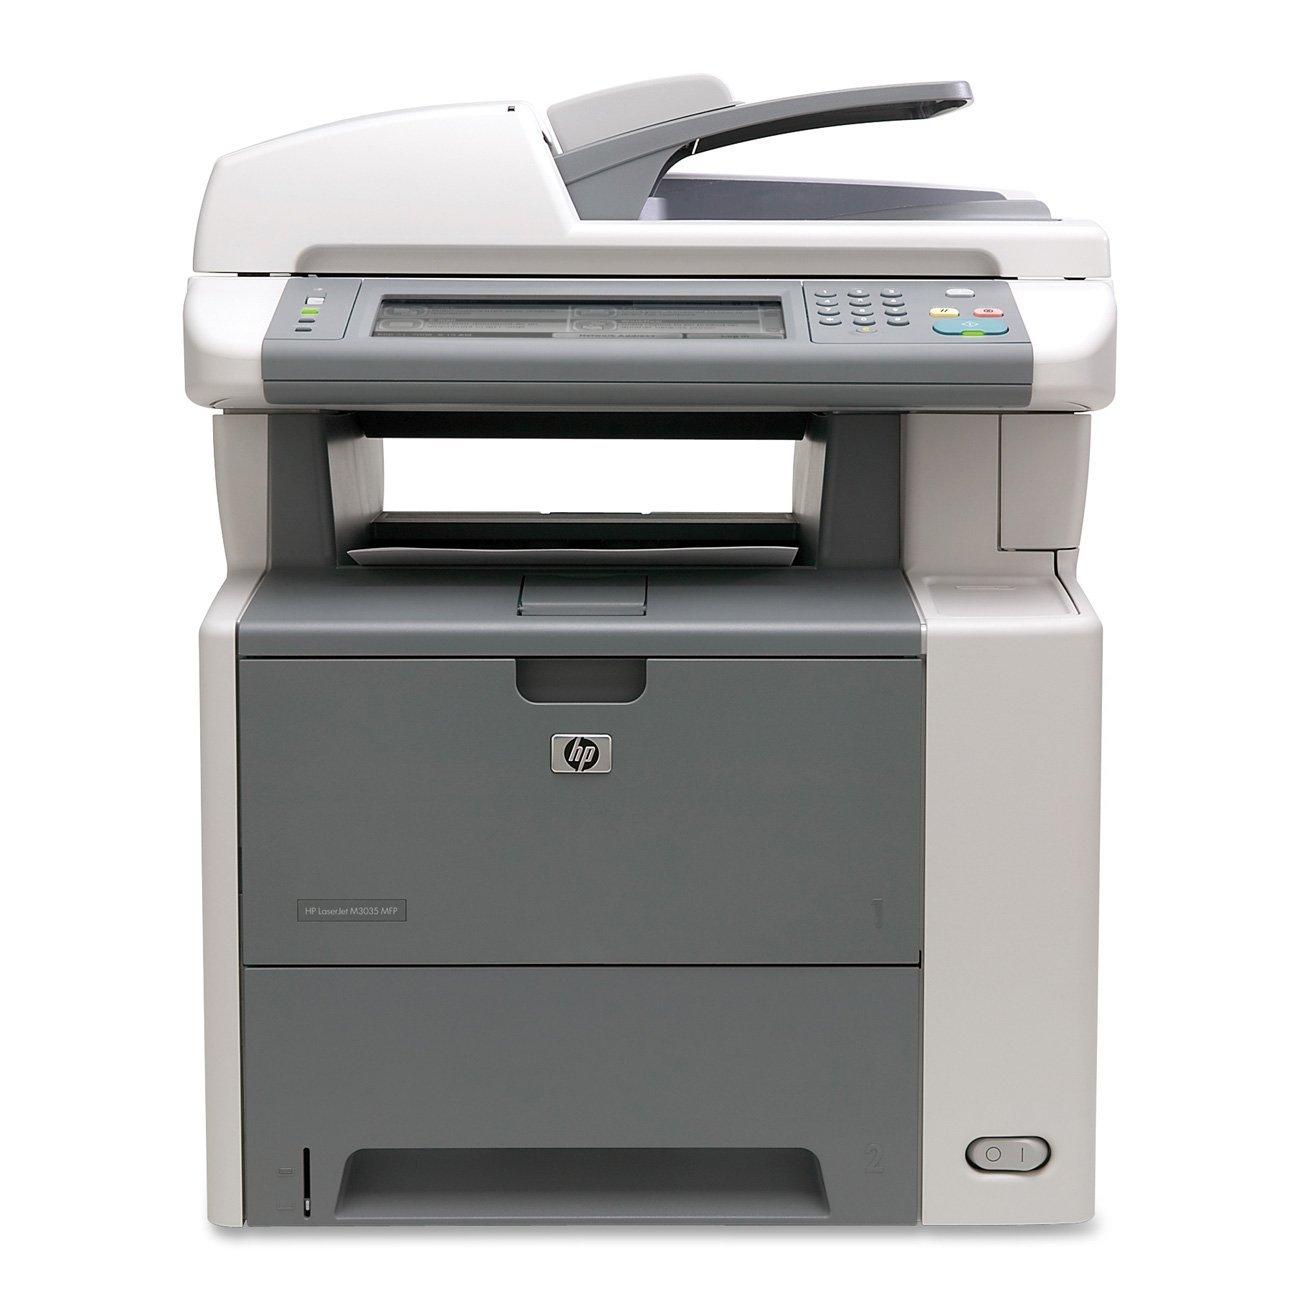 hp m3035 mfp laserjet printer reconditioned copyfaxes rh copyfaxes com hp m3035 service manual HP LaserJet M3035xs MFP Driver